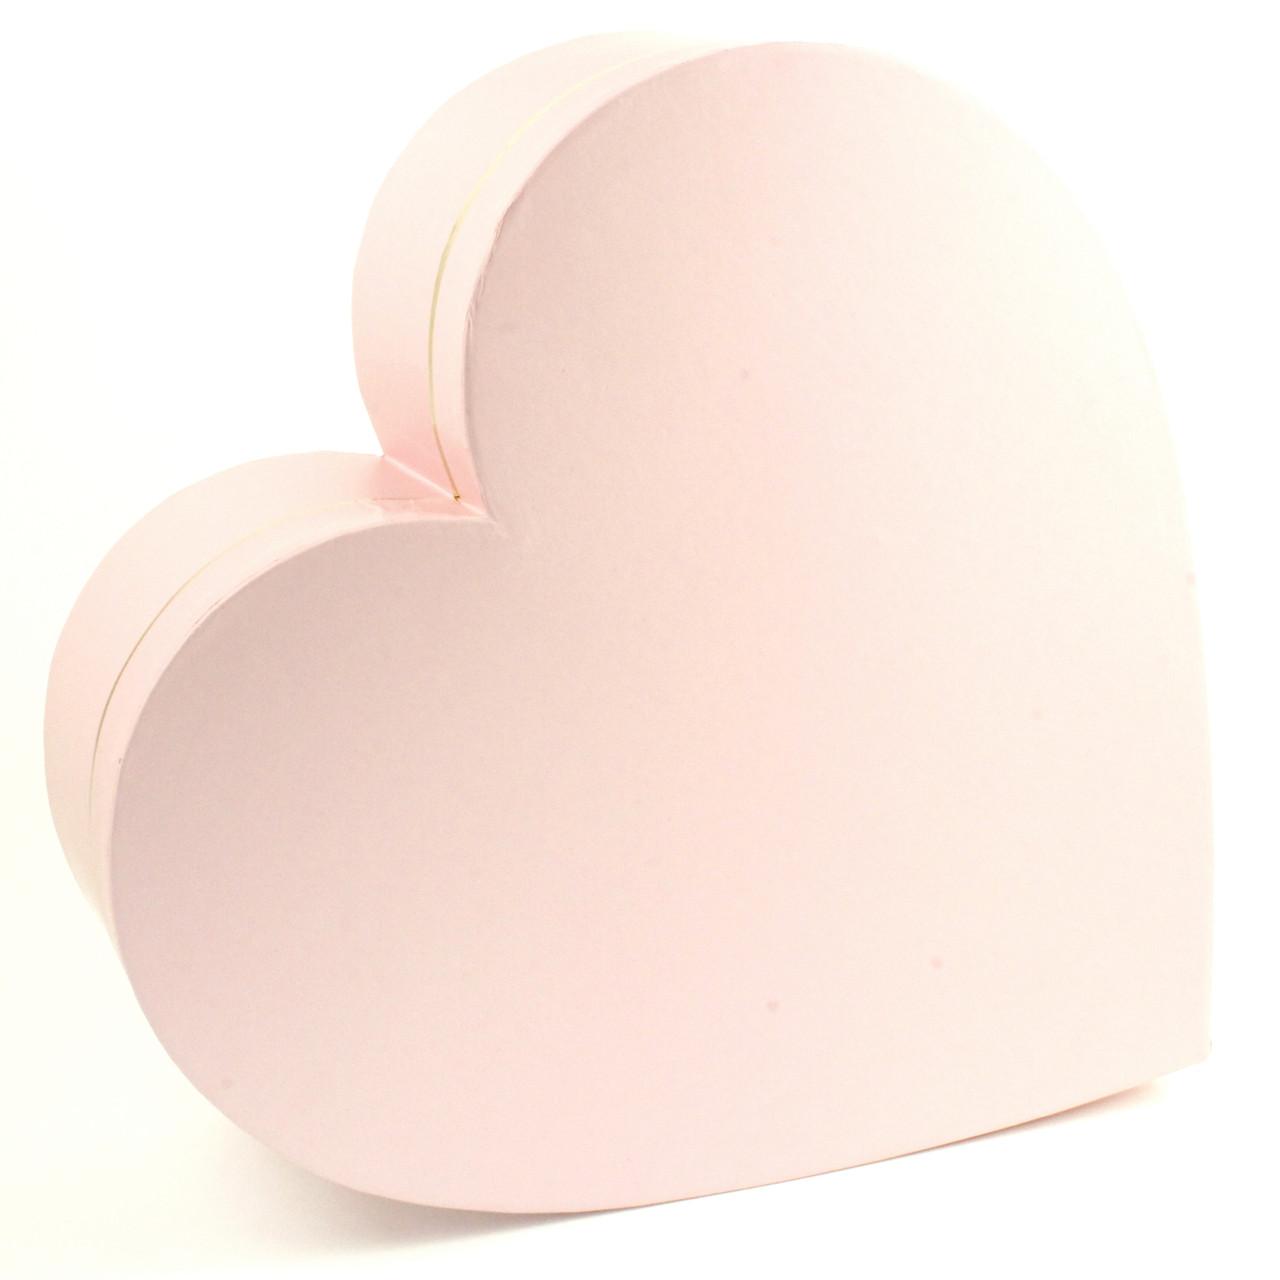 Подарочная коробка Сердце розовая с золотом 29.2 x 28.5 x 10.4 см